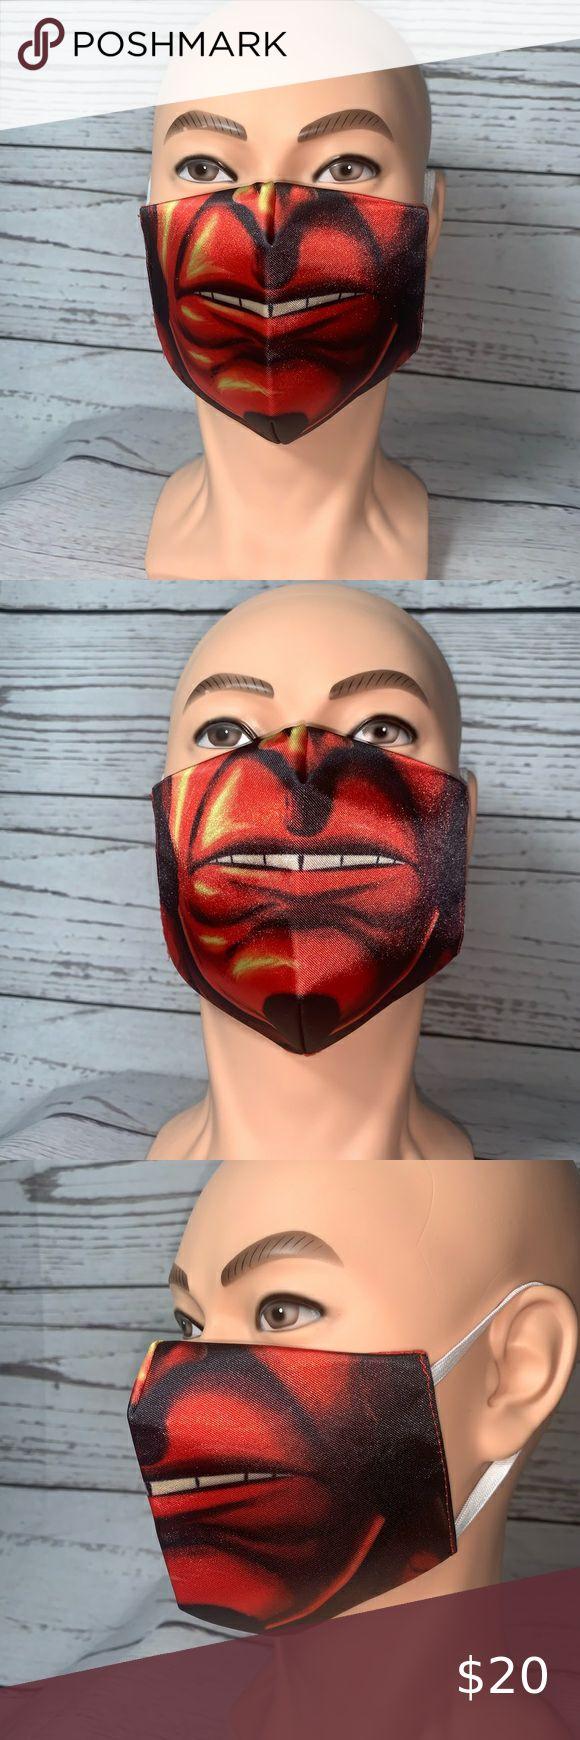 Hellboy Face Mask NEW in 2020 Face mask, Face, Custom design